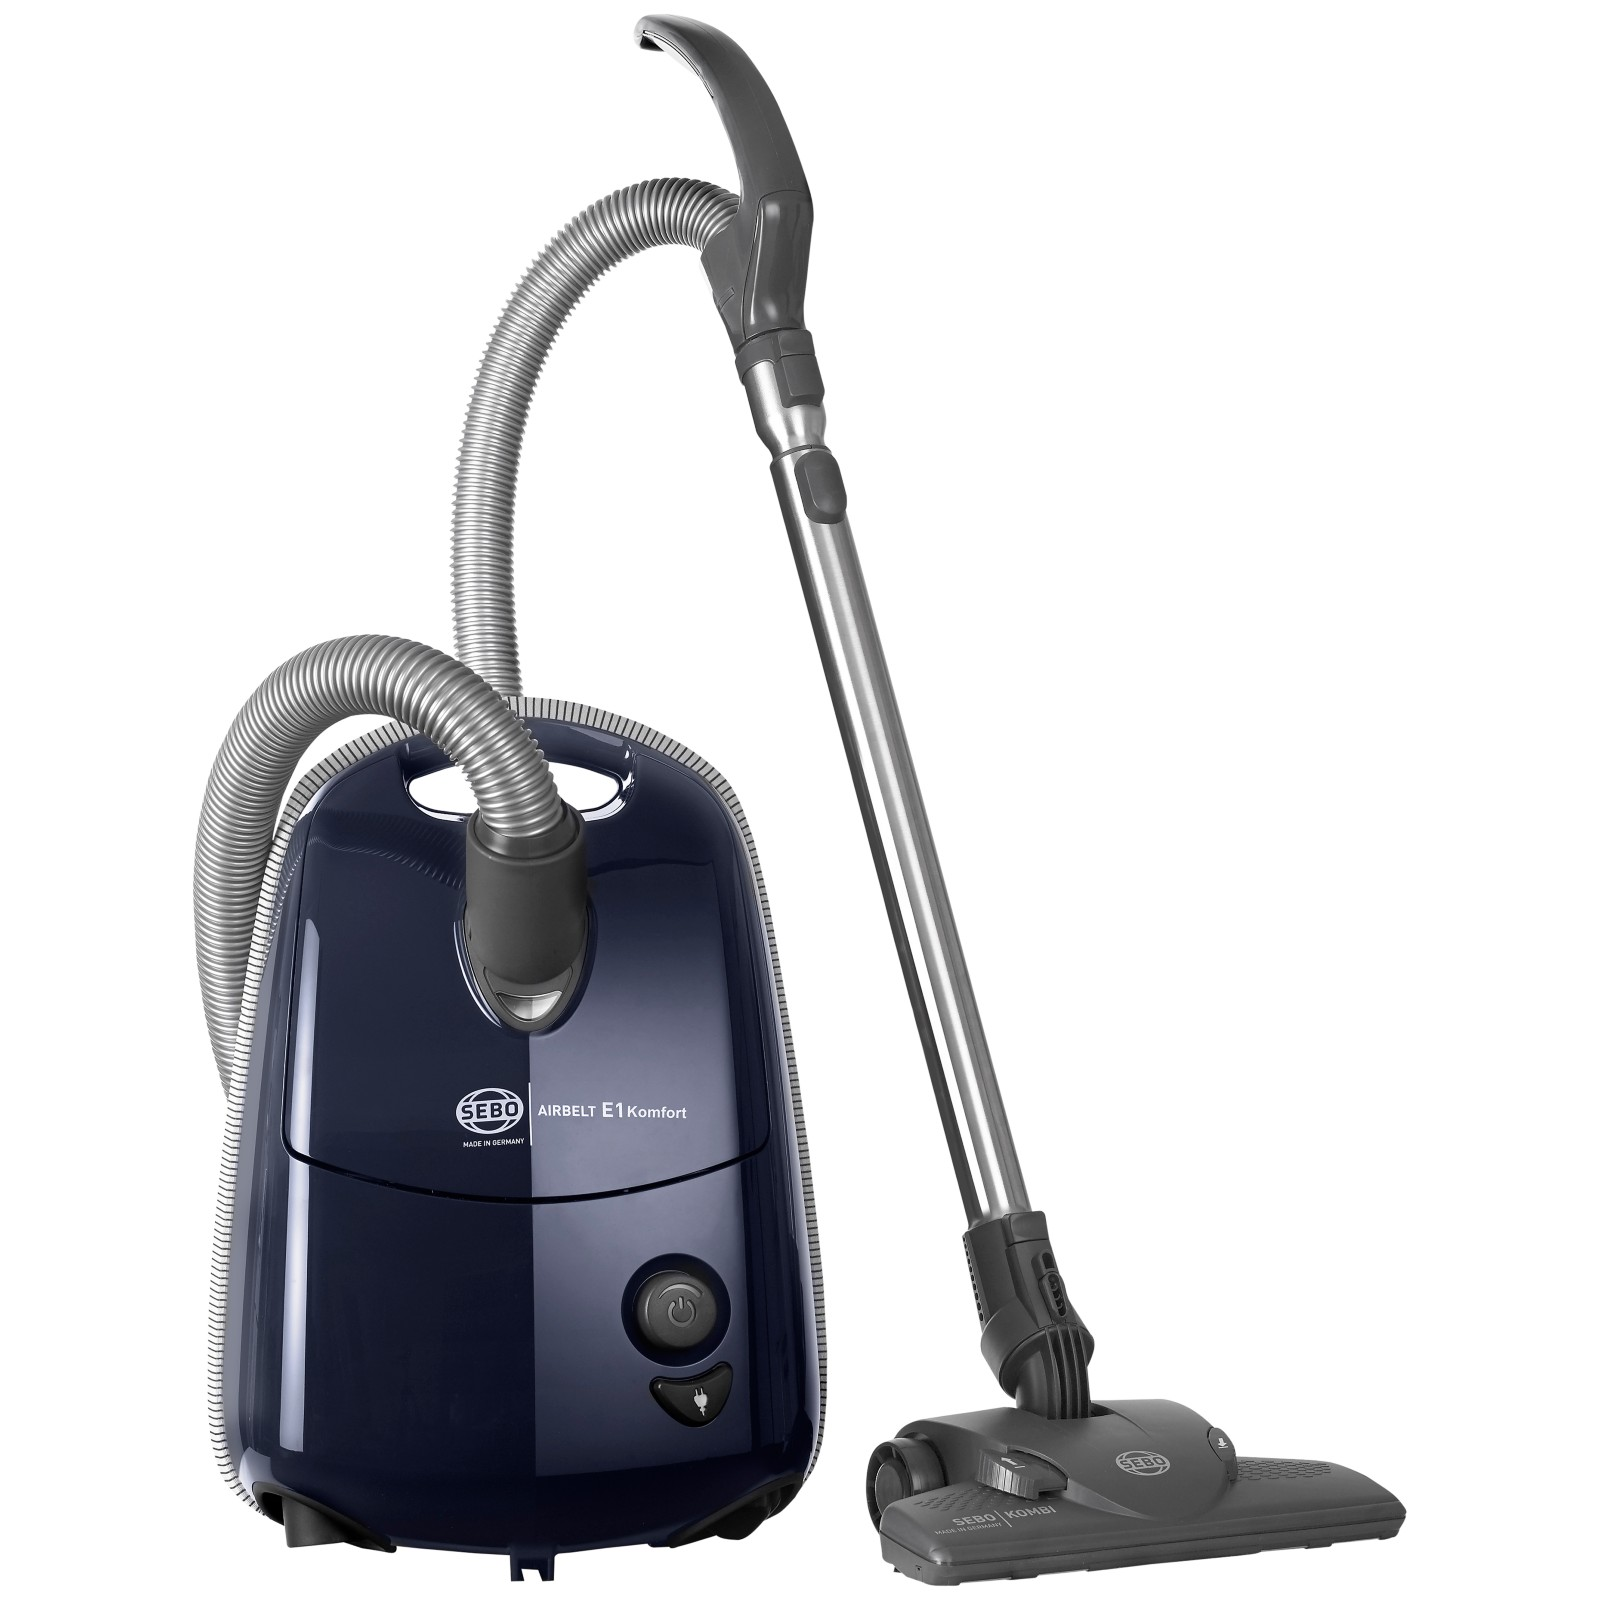 Sebo 91603GB Airbelt E1 Komfort Cylinder Vacuum Cleaner